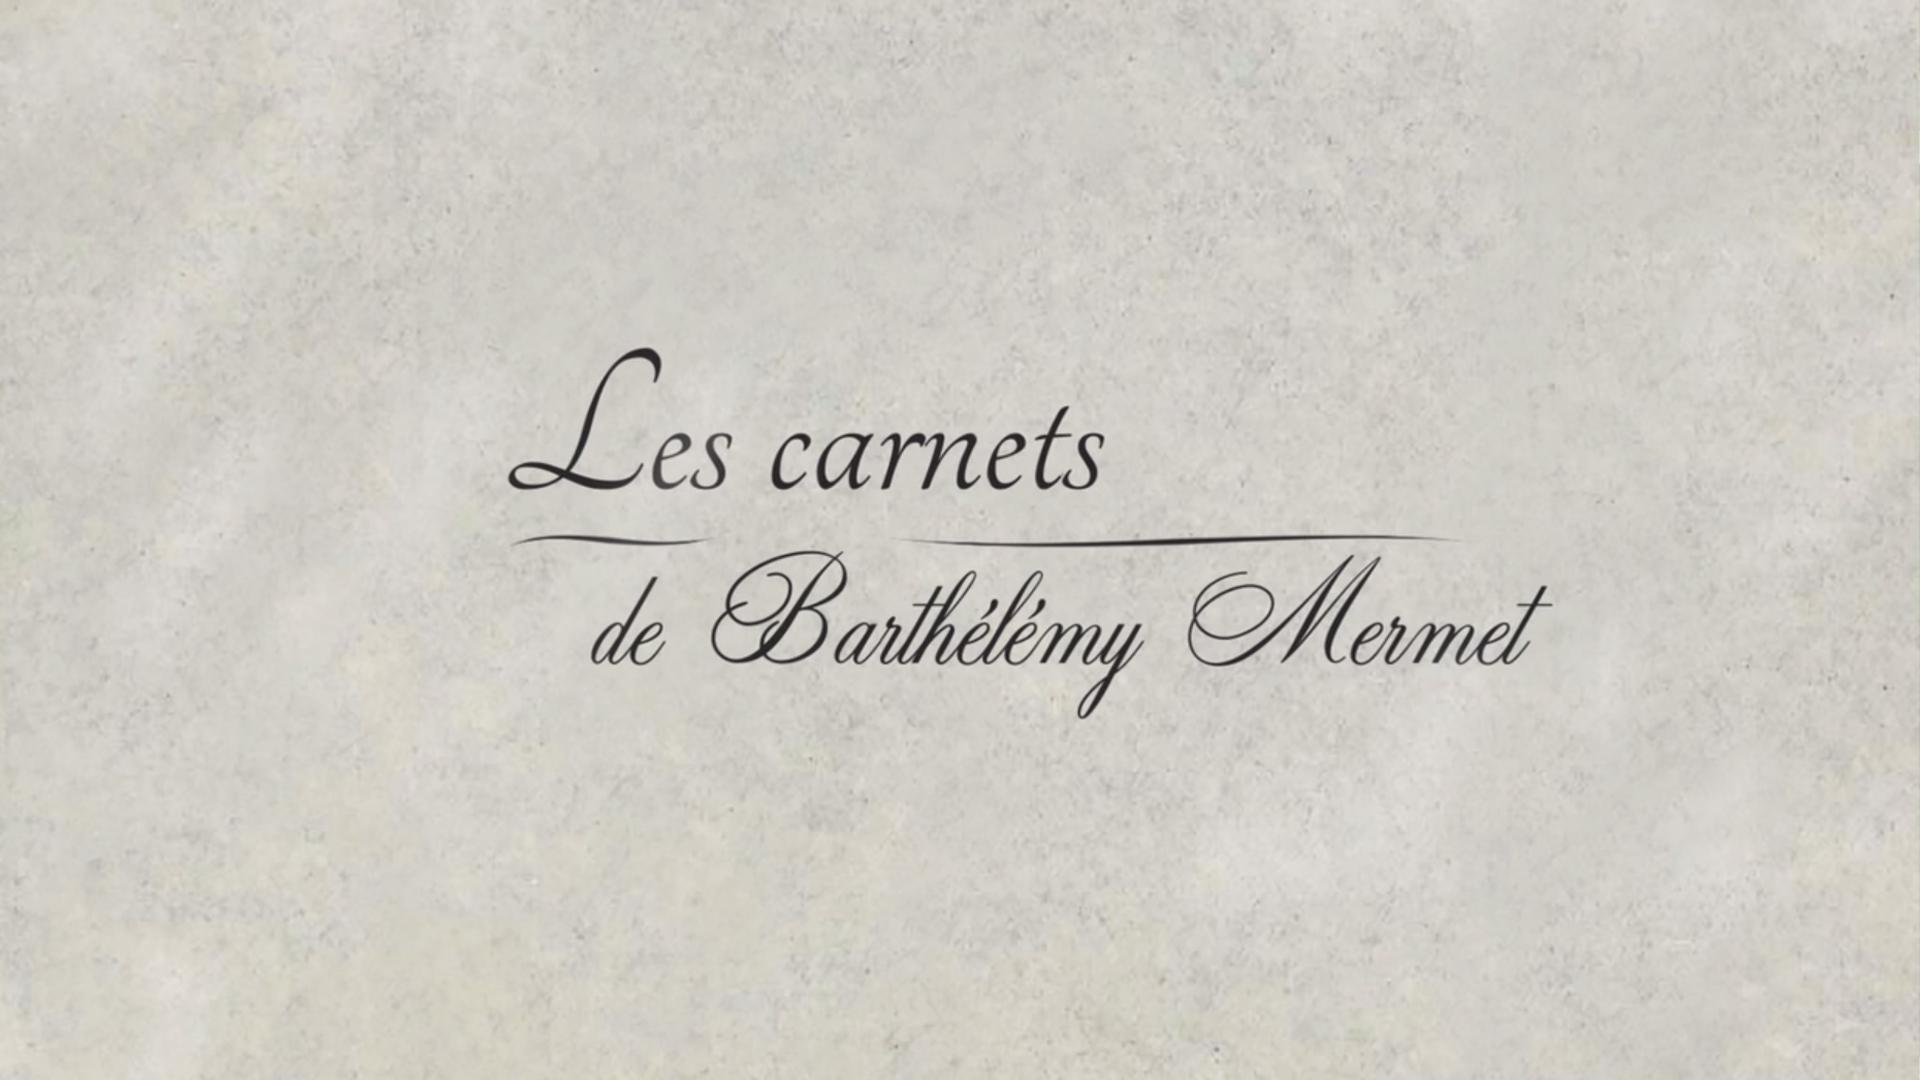 Les carnets de Barthélémy Mermet - Documentaire 52'